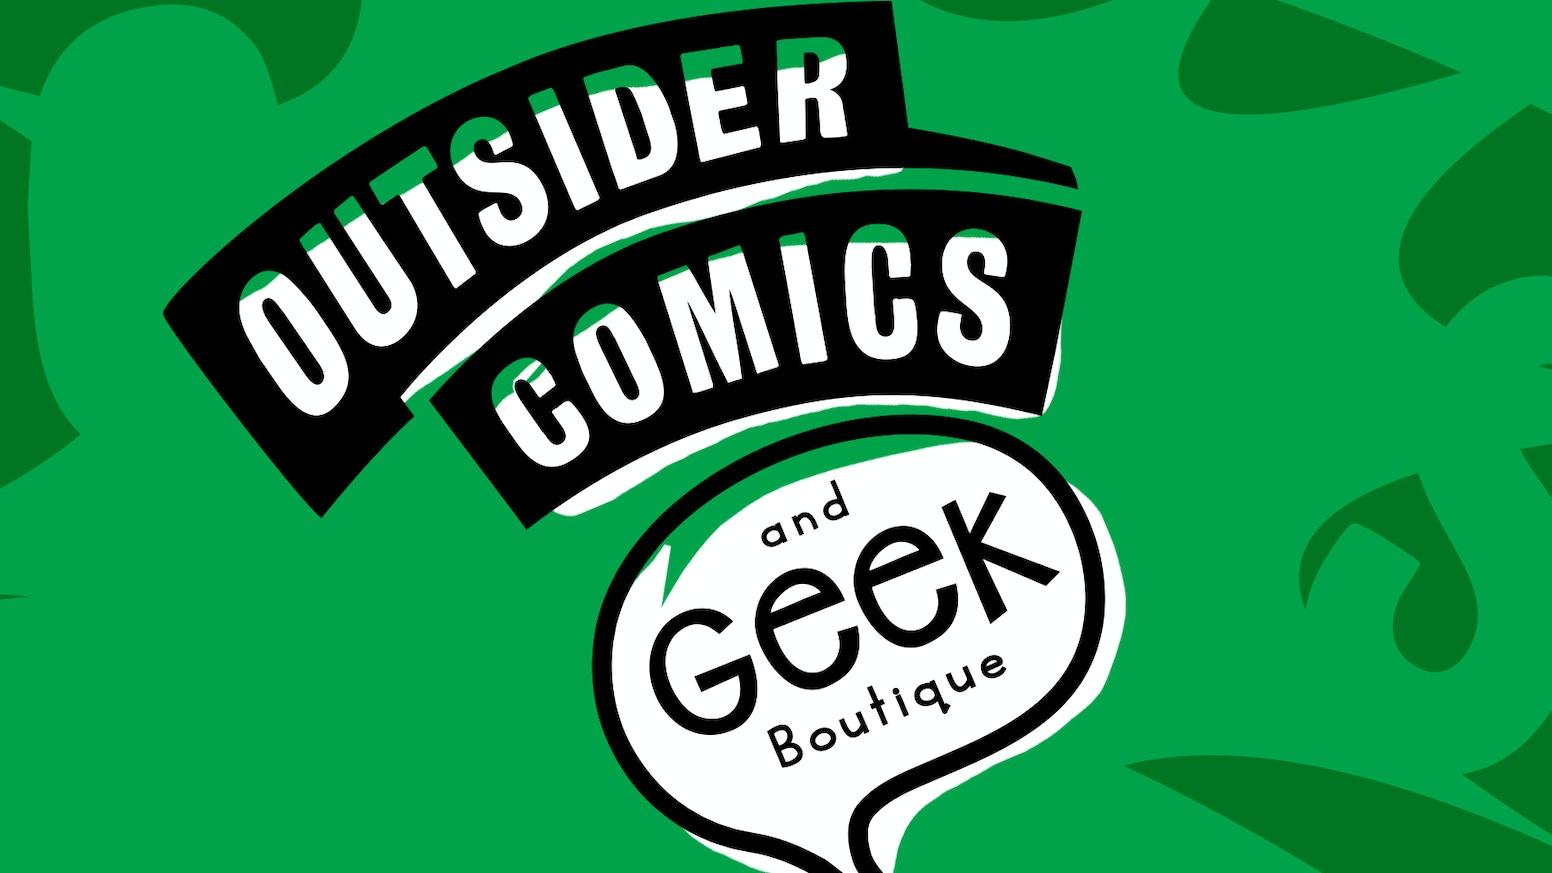 c9ad5cc757cac6 Outsider Comics and Geek Boutique by Jill Taplin — Kickstarter